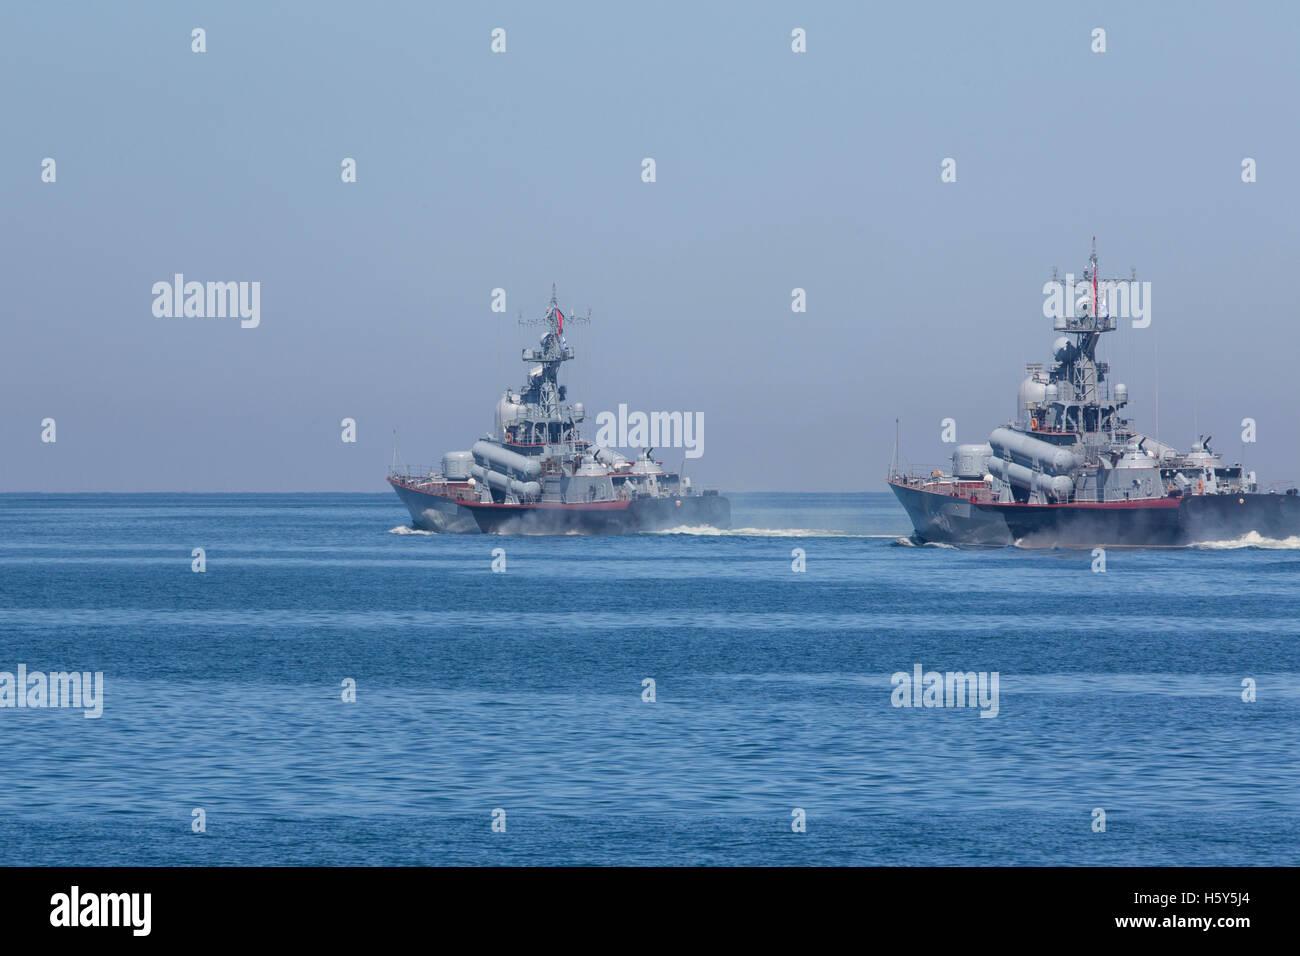 View of the Russian Black Sea Fleet squadron during Navy parade raid in Sevastopol Bay,Crimea Republic - Stock Image